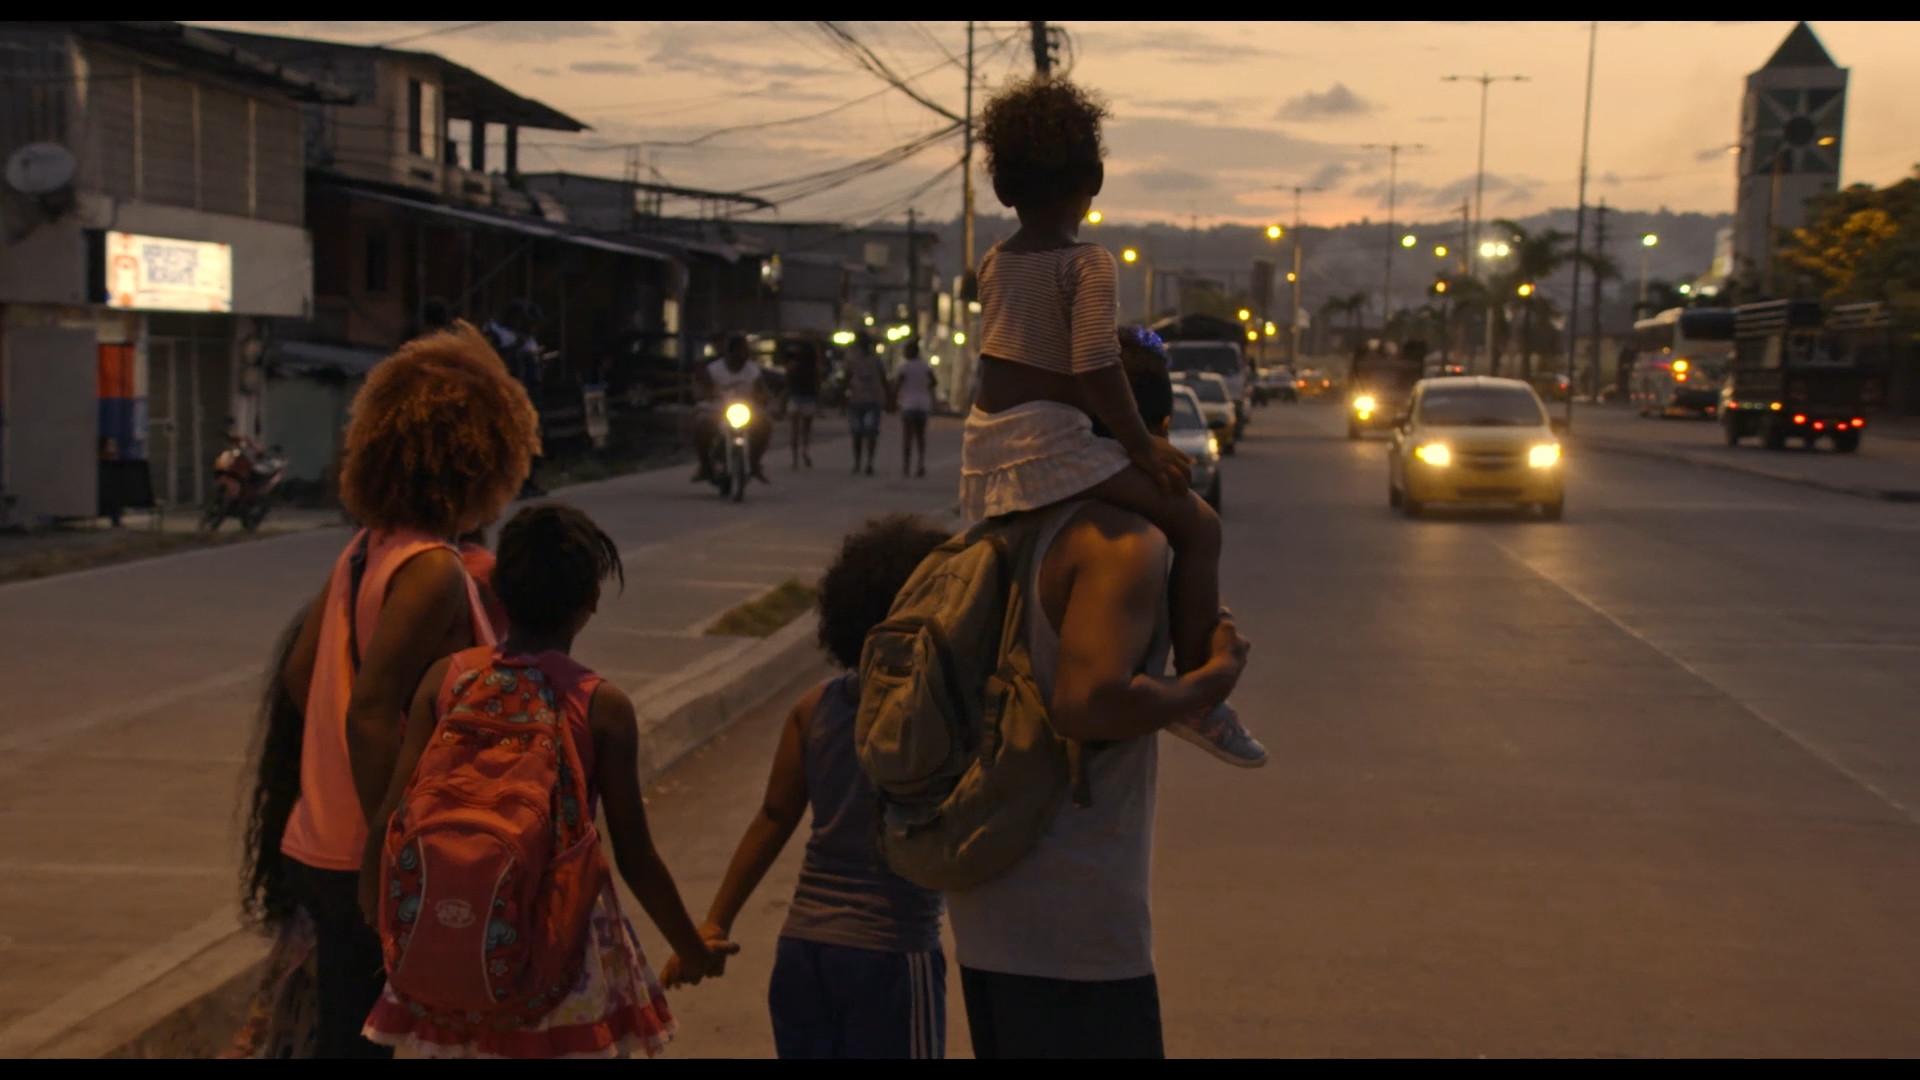 Family walking along city street at sunset